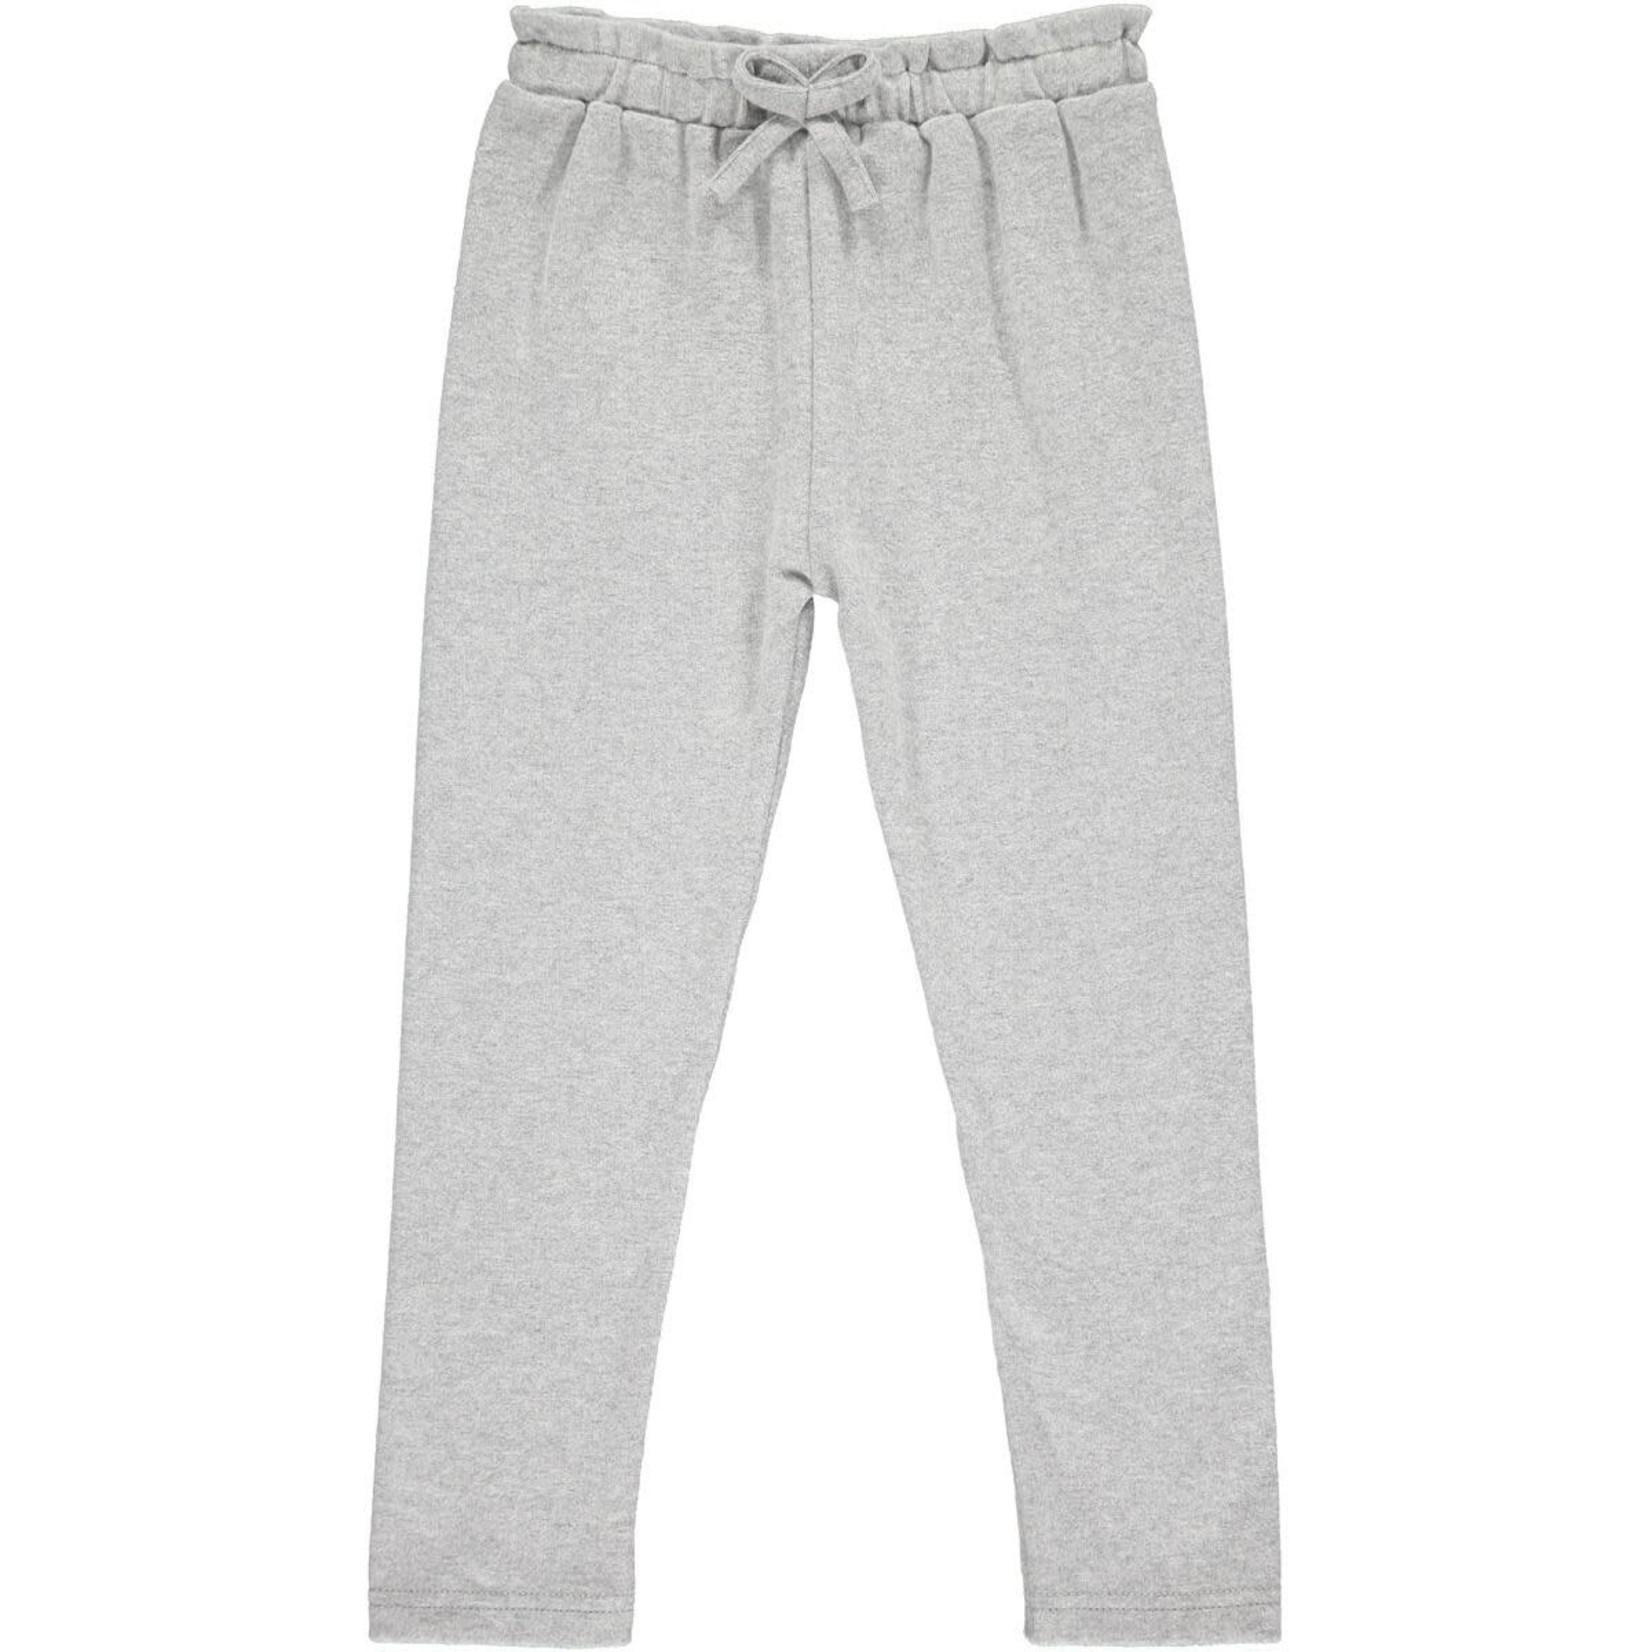 Vignette Fawn Baby Leggings - Grey